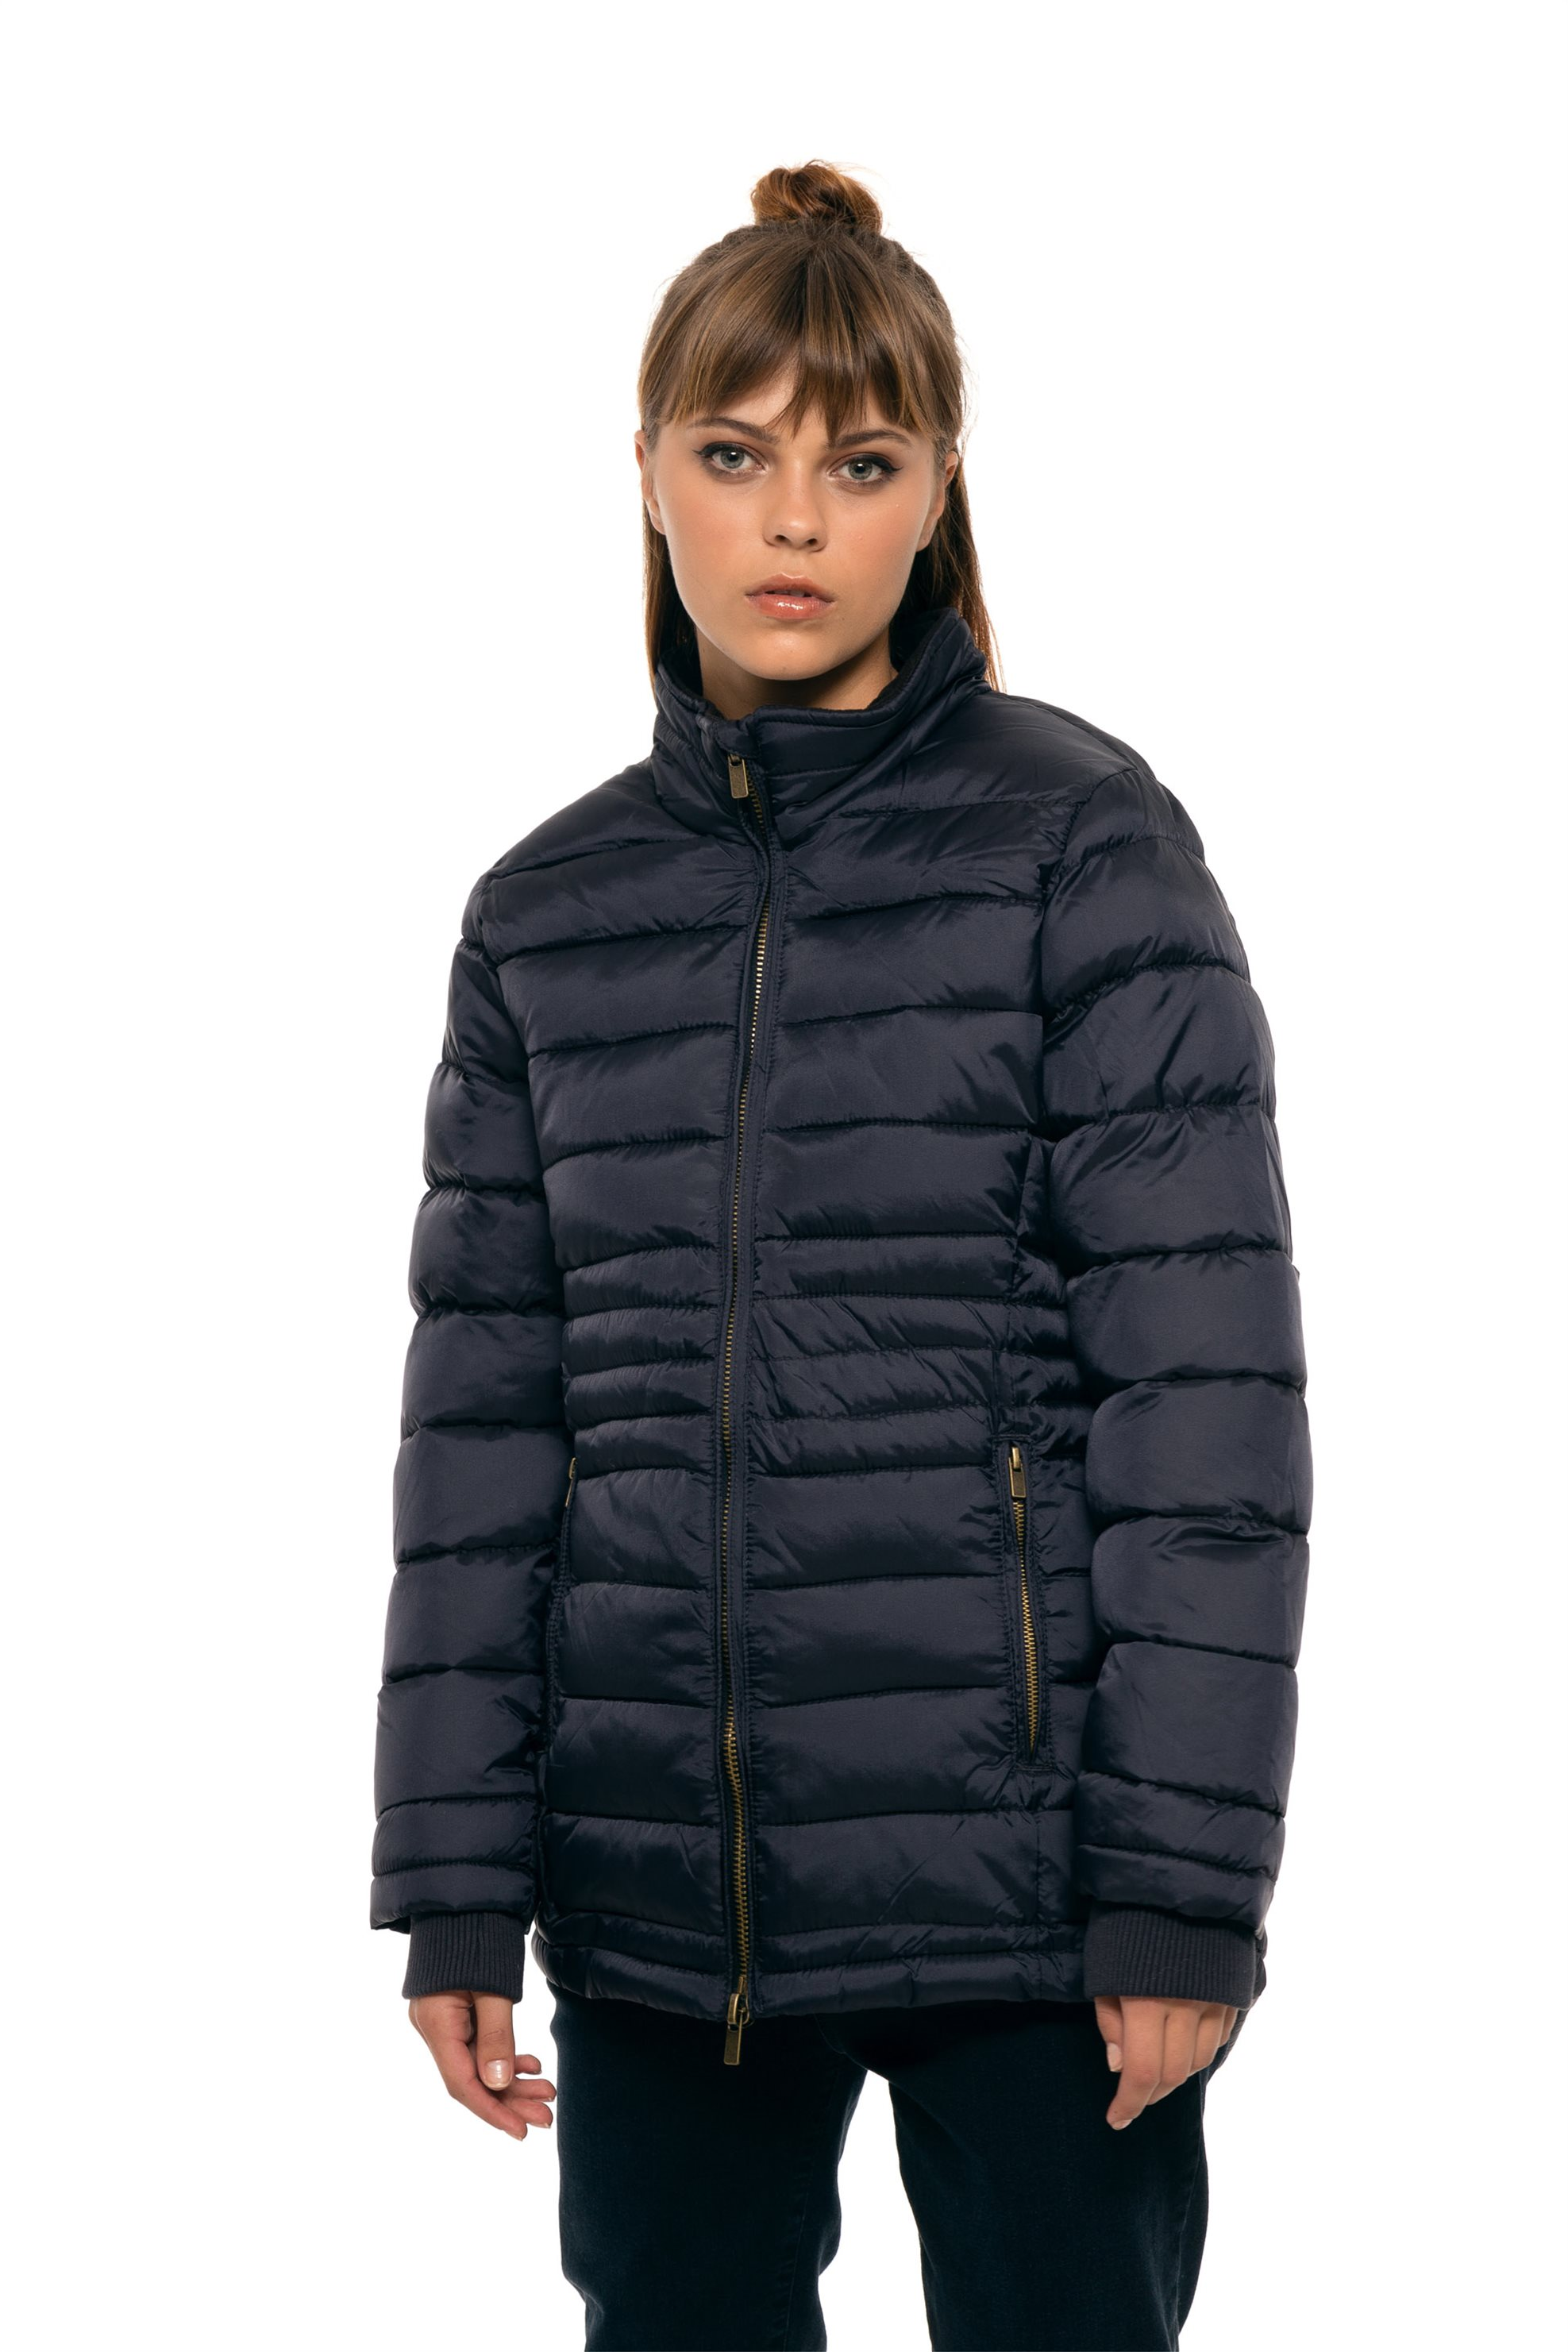 Notos Fransa γυναικείο καπιτονέ μπουφάν με ψηλό γιακά - 20604545 - Μπλε  Σκούρο 90c0513d00e